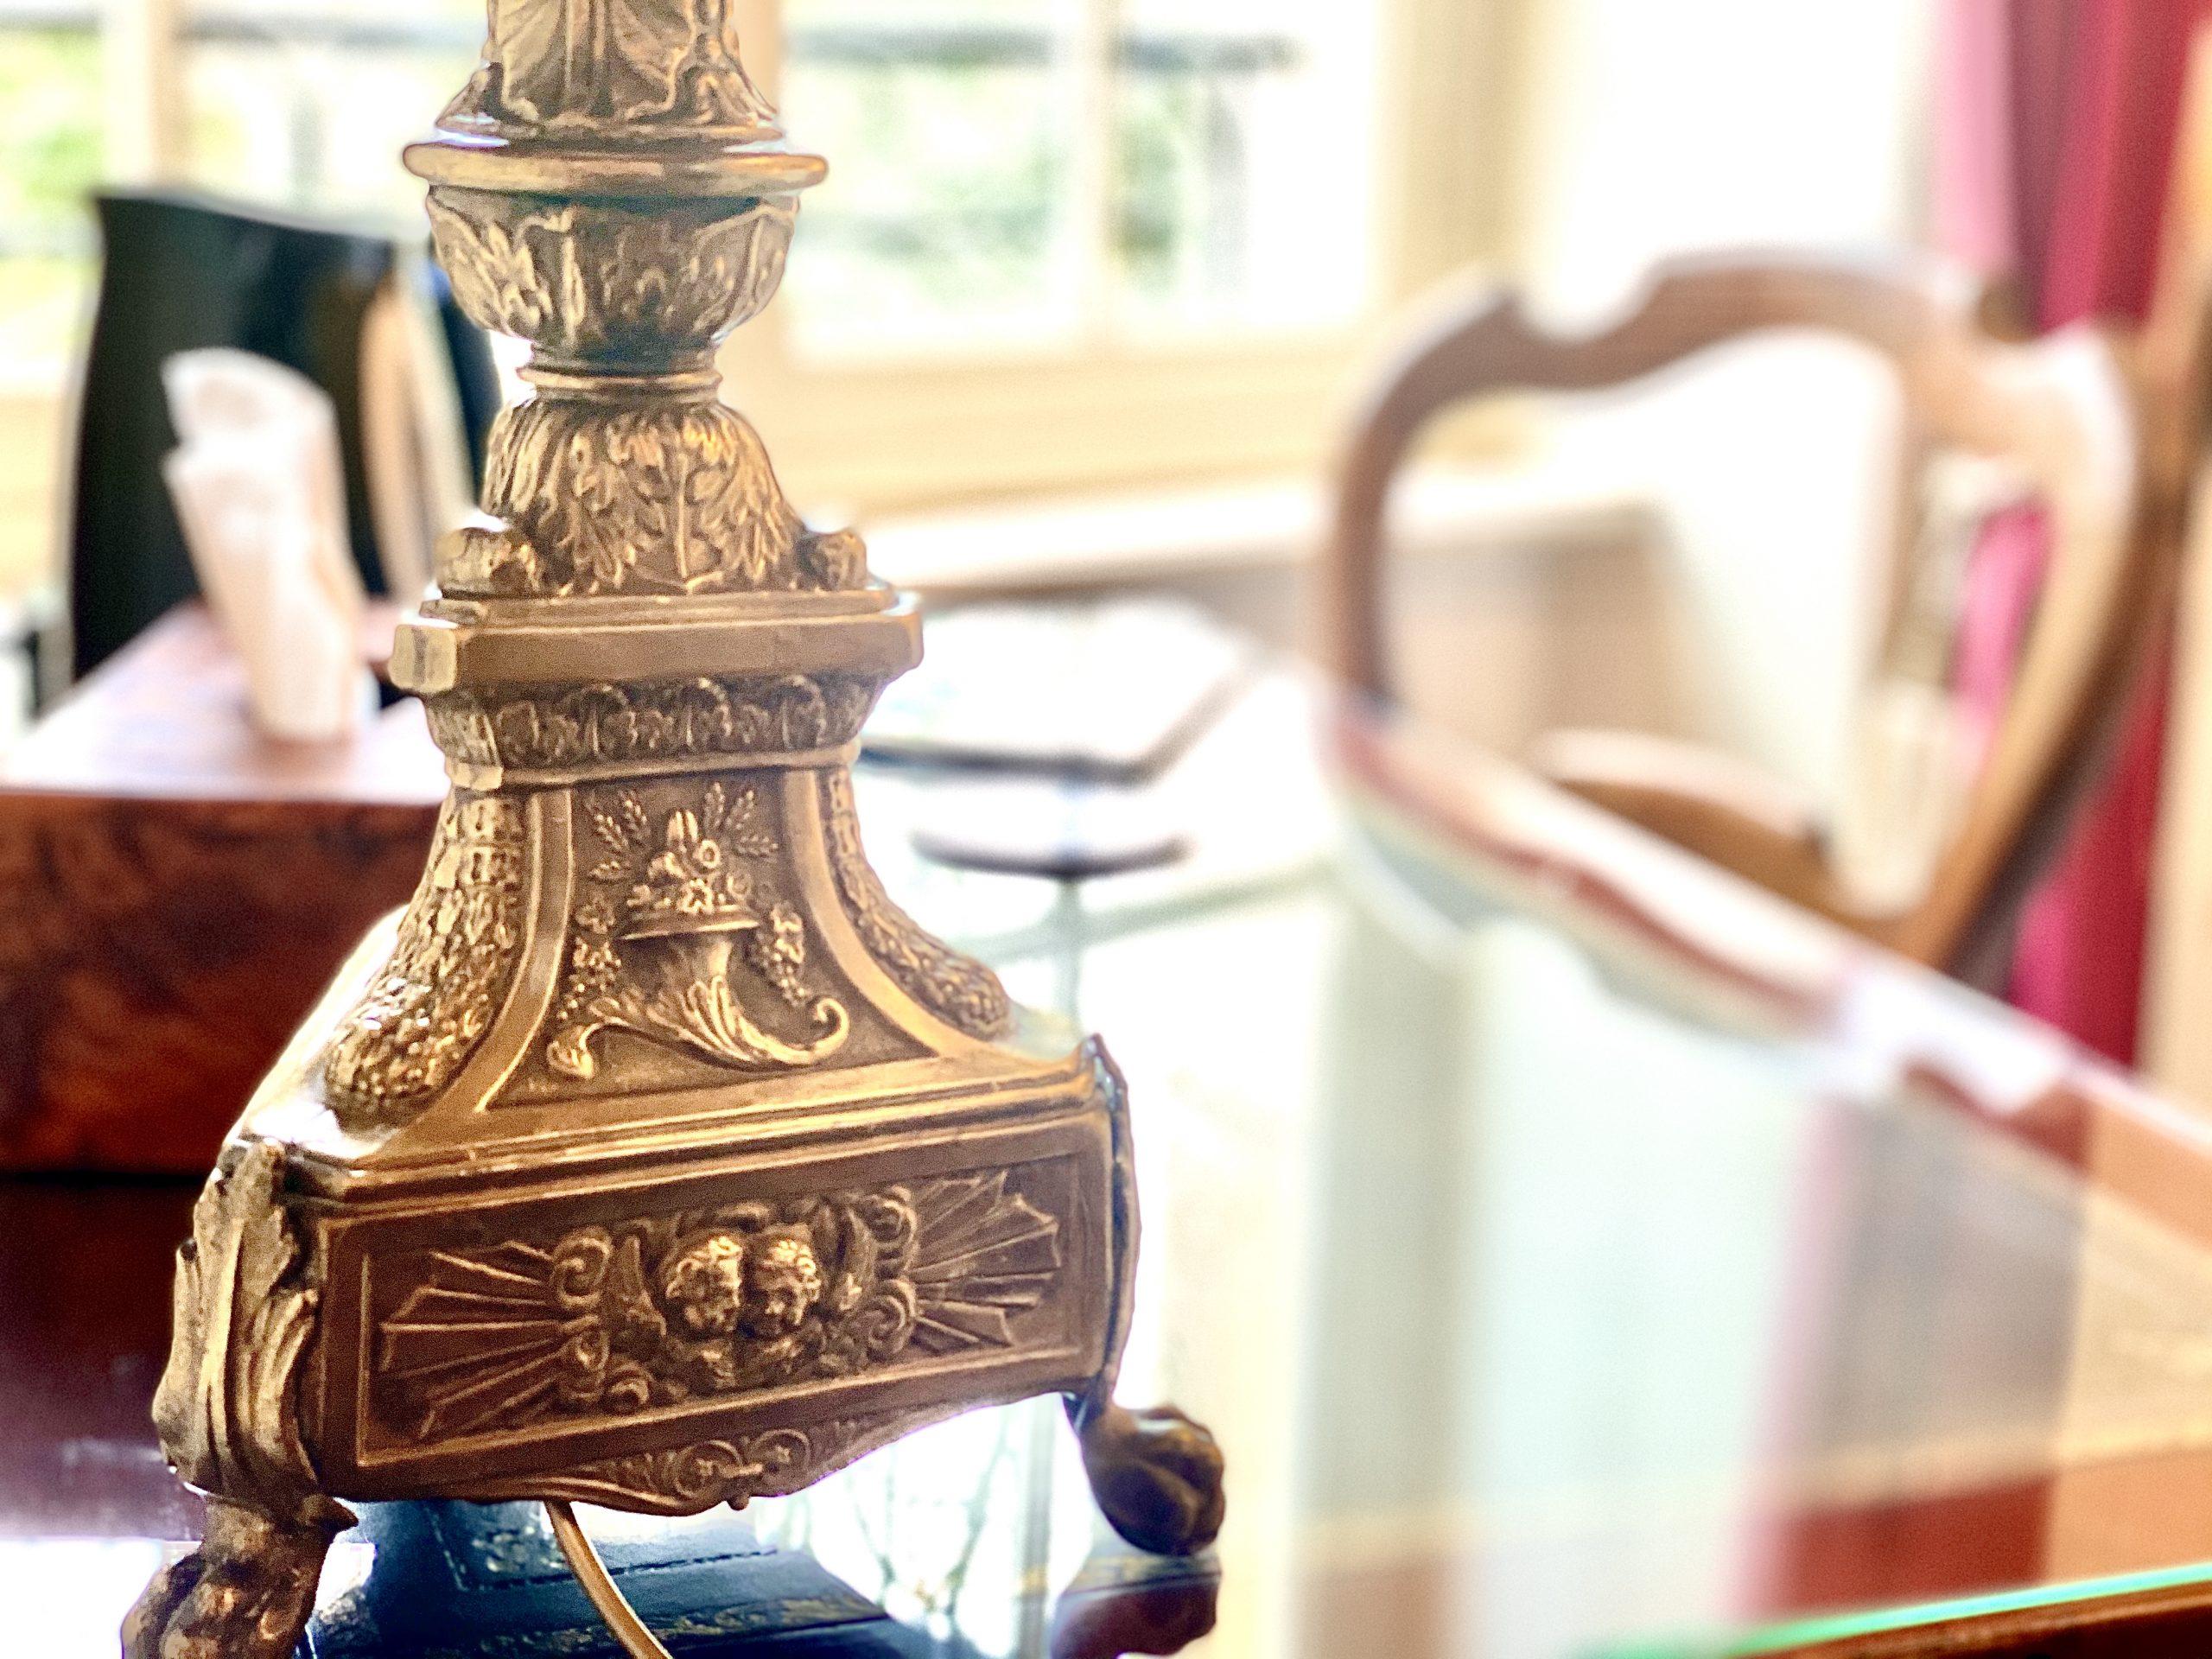 Pied lampe et bureau reflets Ruliver